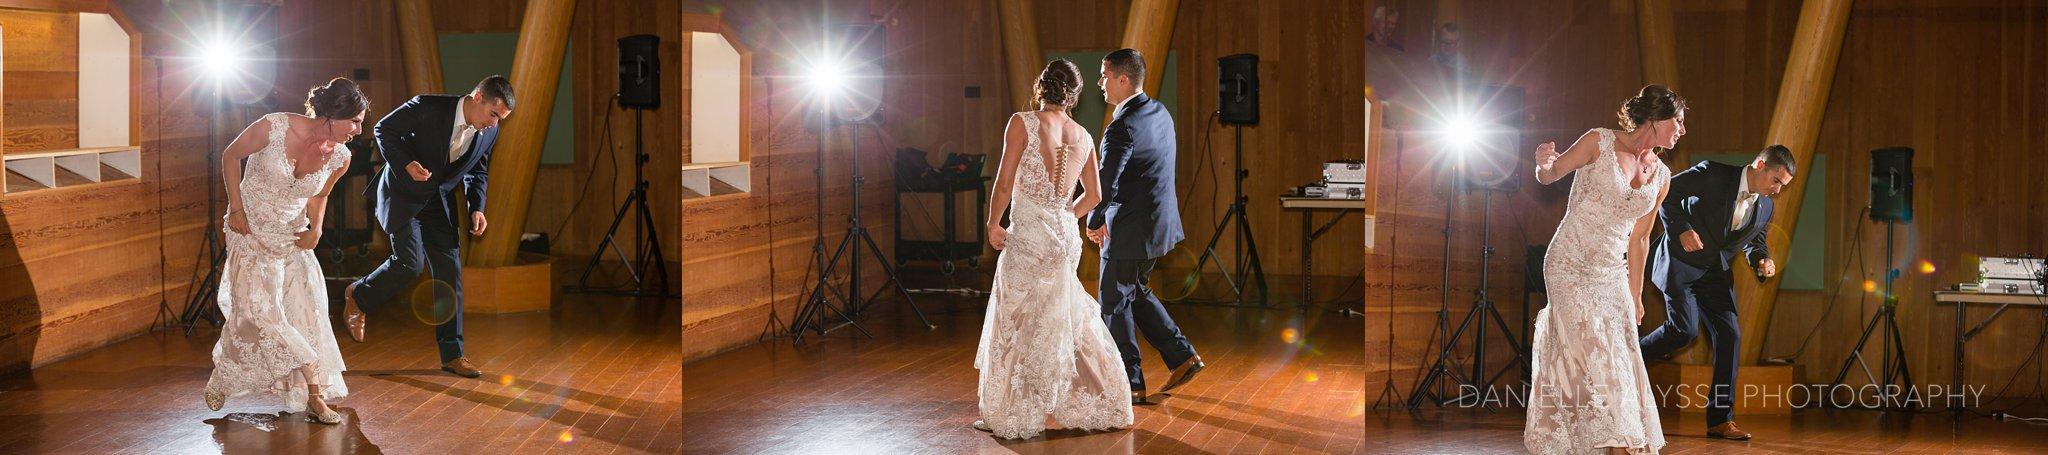 170429_blog_kimberly_ben_wedding_san_mateo_curiodyssey_danielle_alysse_photography_sacramento_photographer0791_WEB.jpg